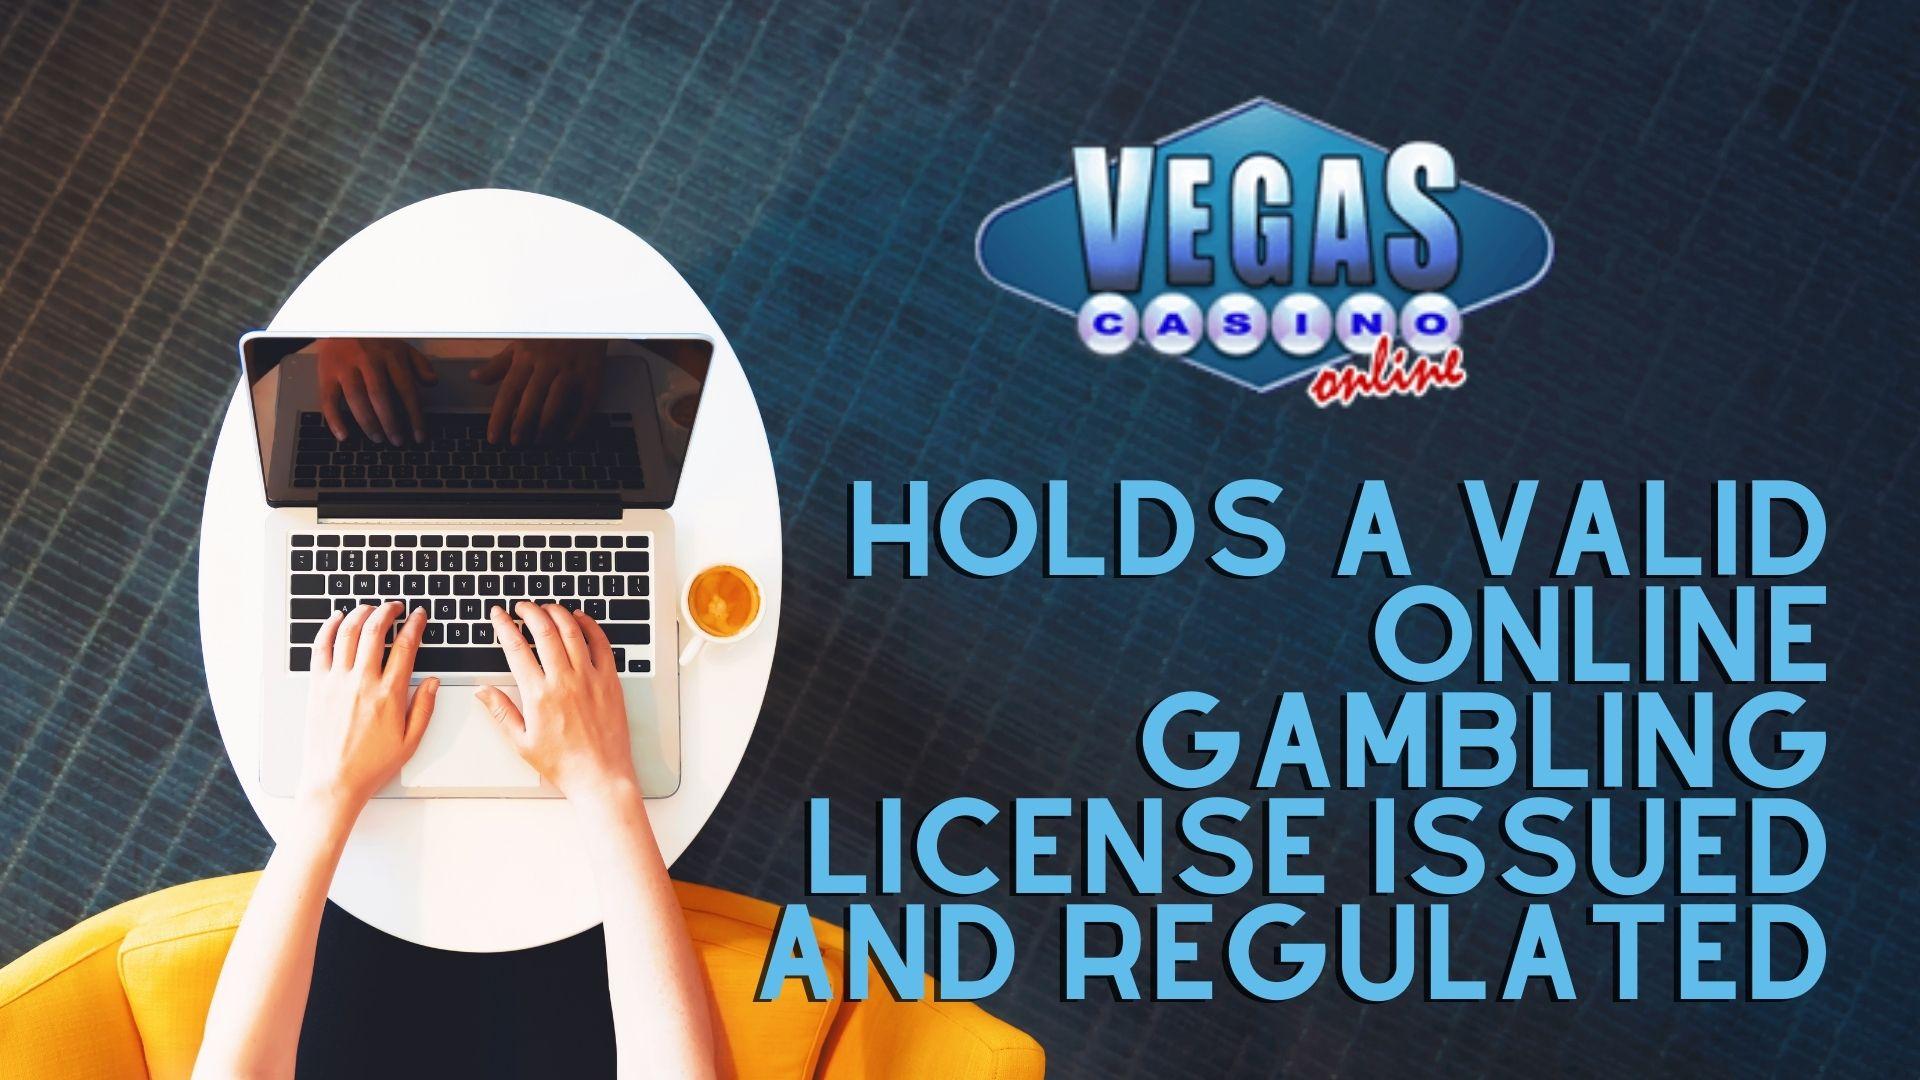 Vegas Casino Online License